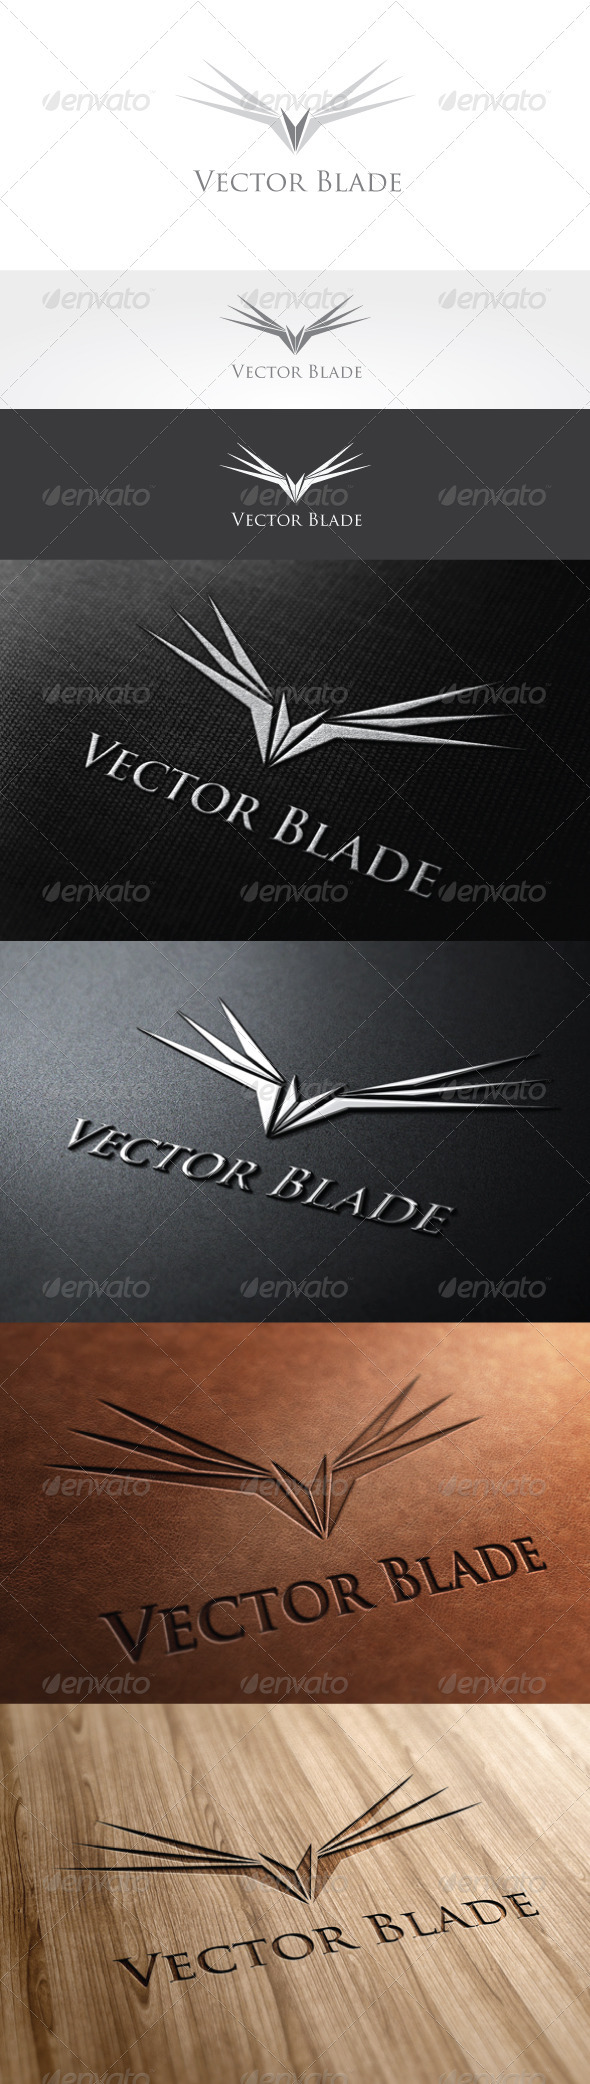 Vector Blade Logo Template - Letters Logo Templates